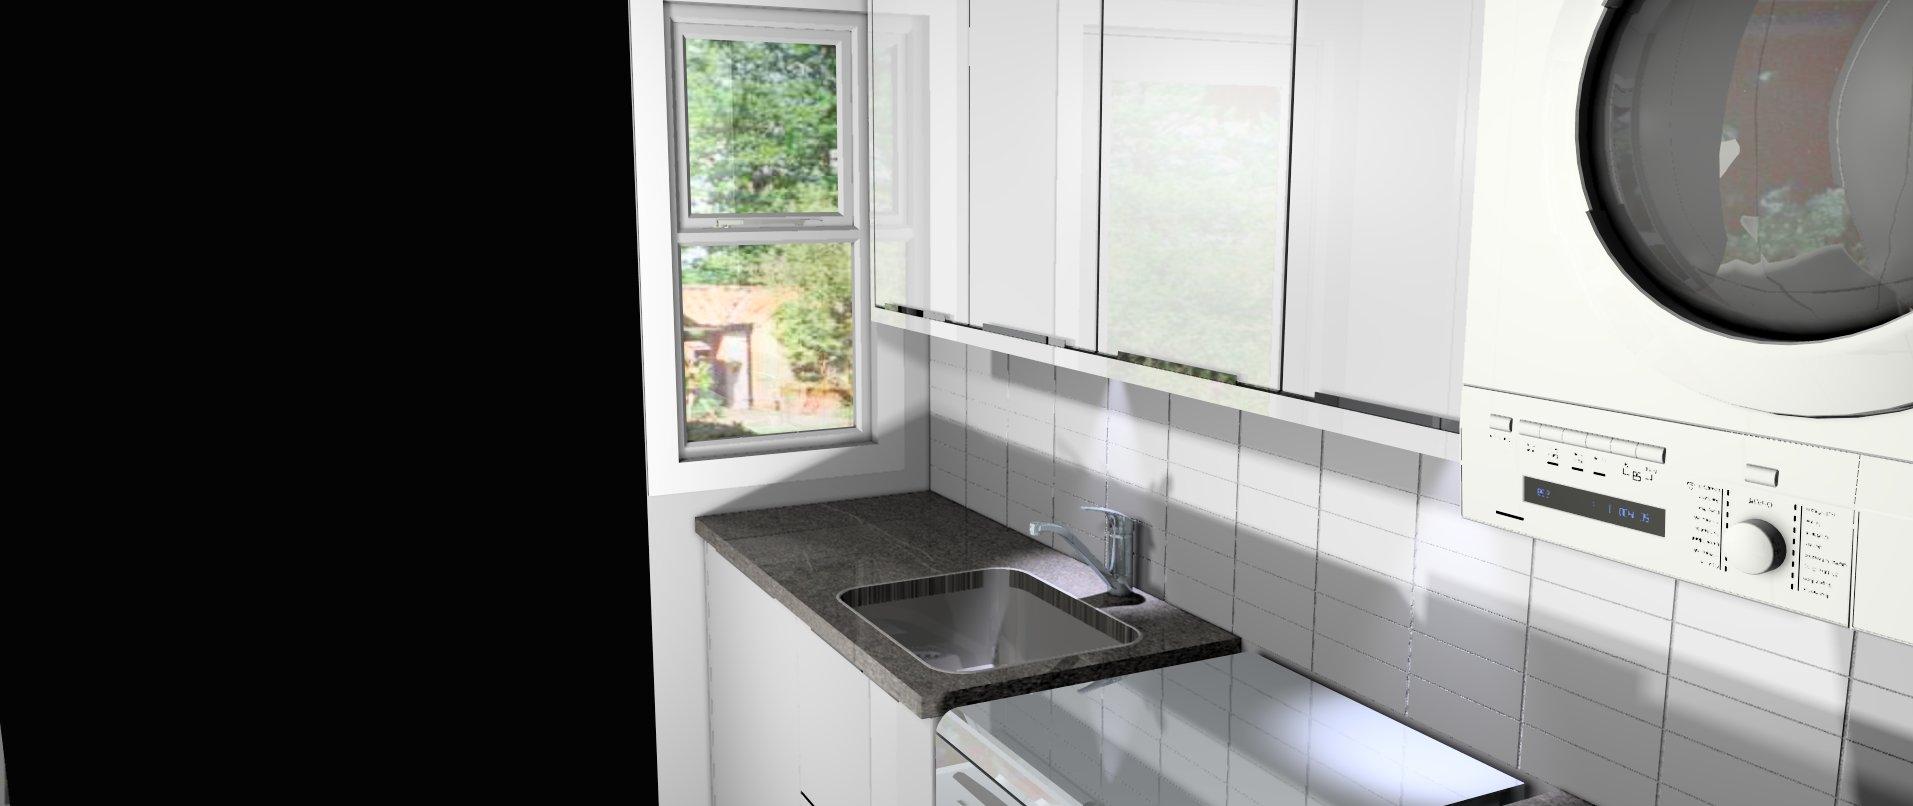 Kitchens Laundry 39 S Rachel Evans Design Christchurch Kitchen Designer